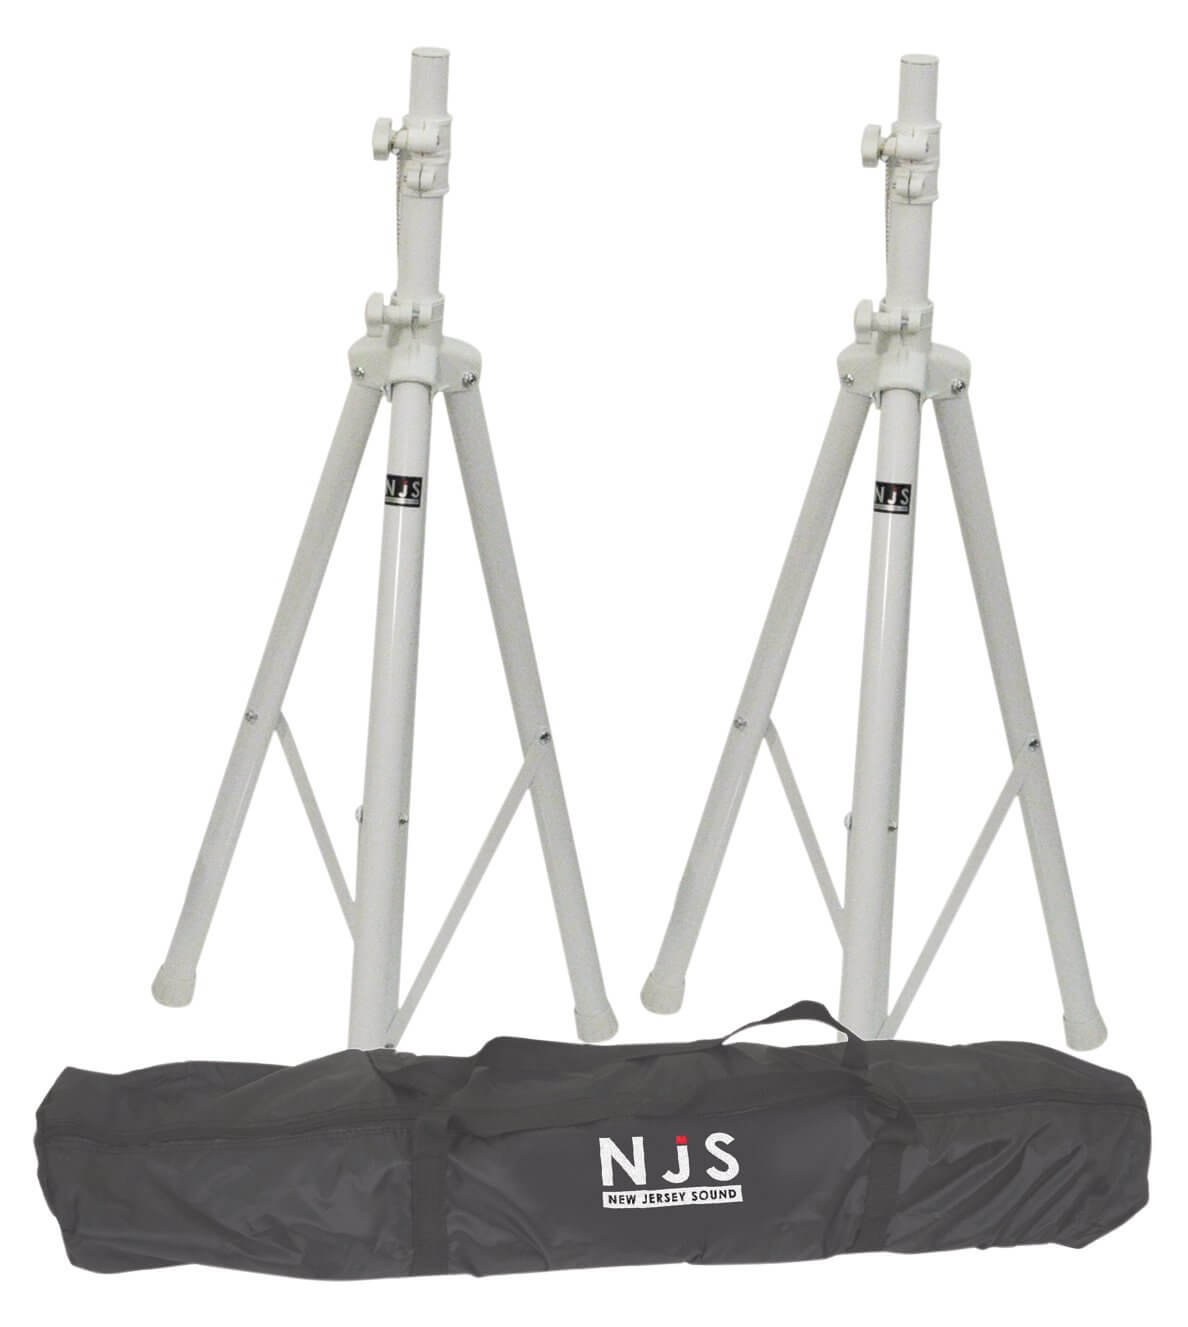 NJS White Speaker Stand Kit Including Bag Pair of Heavy Duty Stands